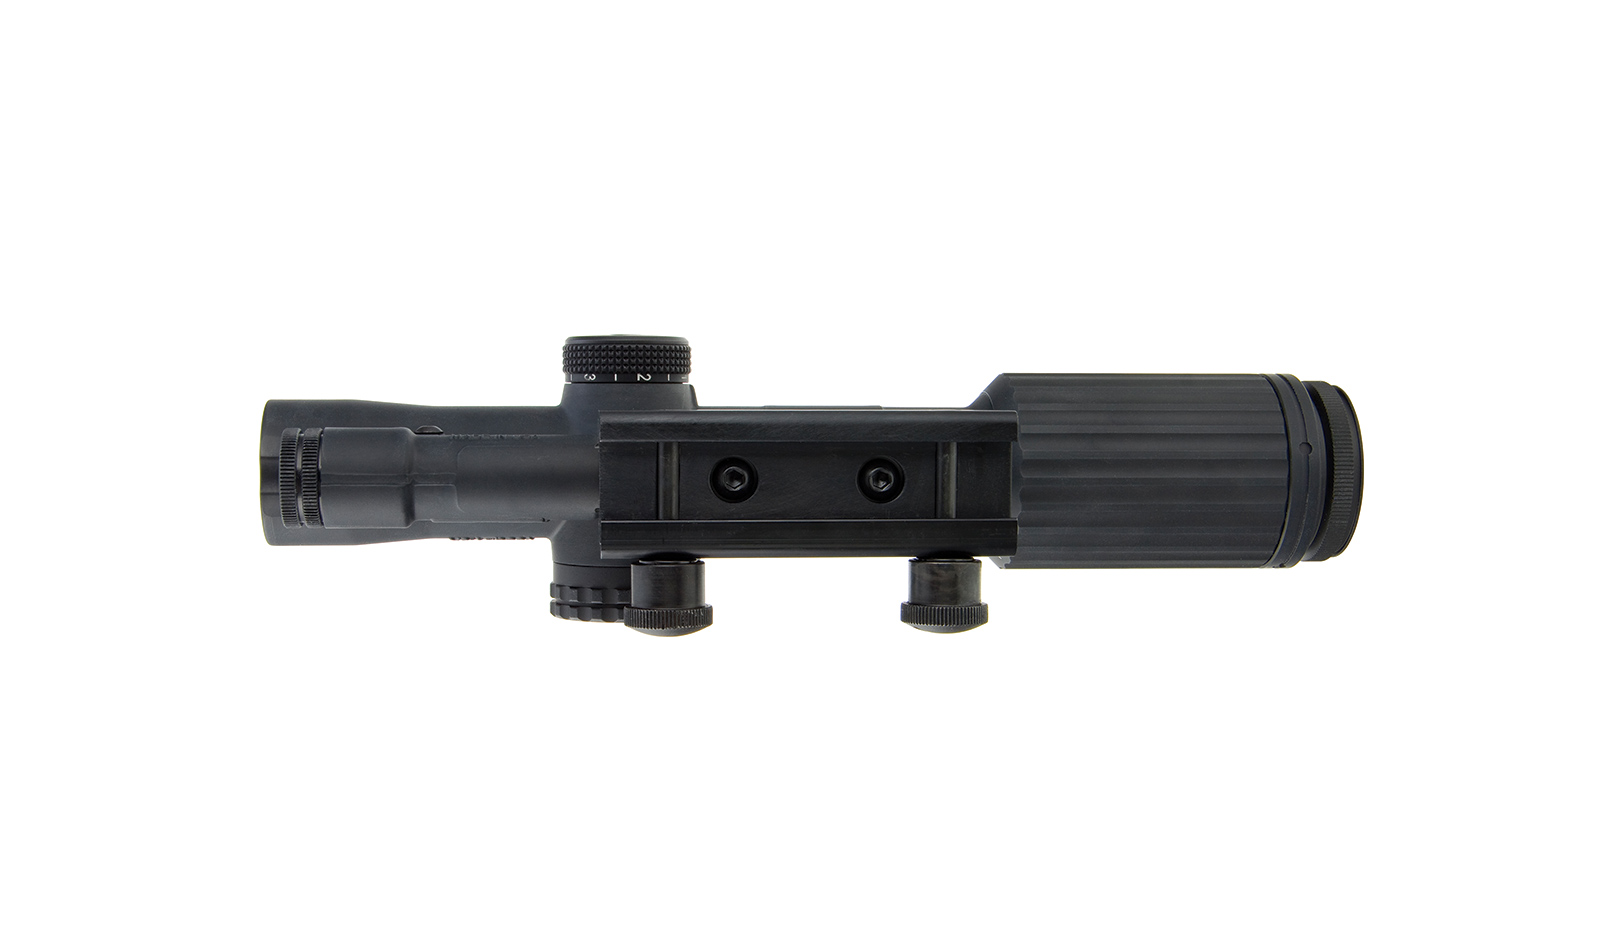 VC16-C-1600006 angle 10